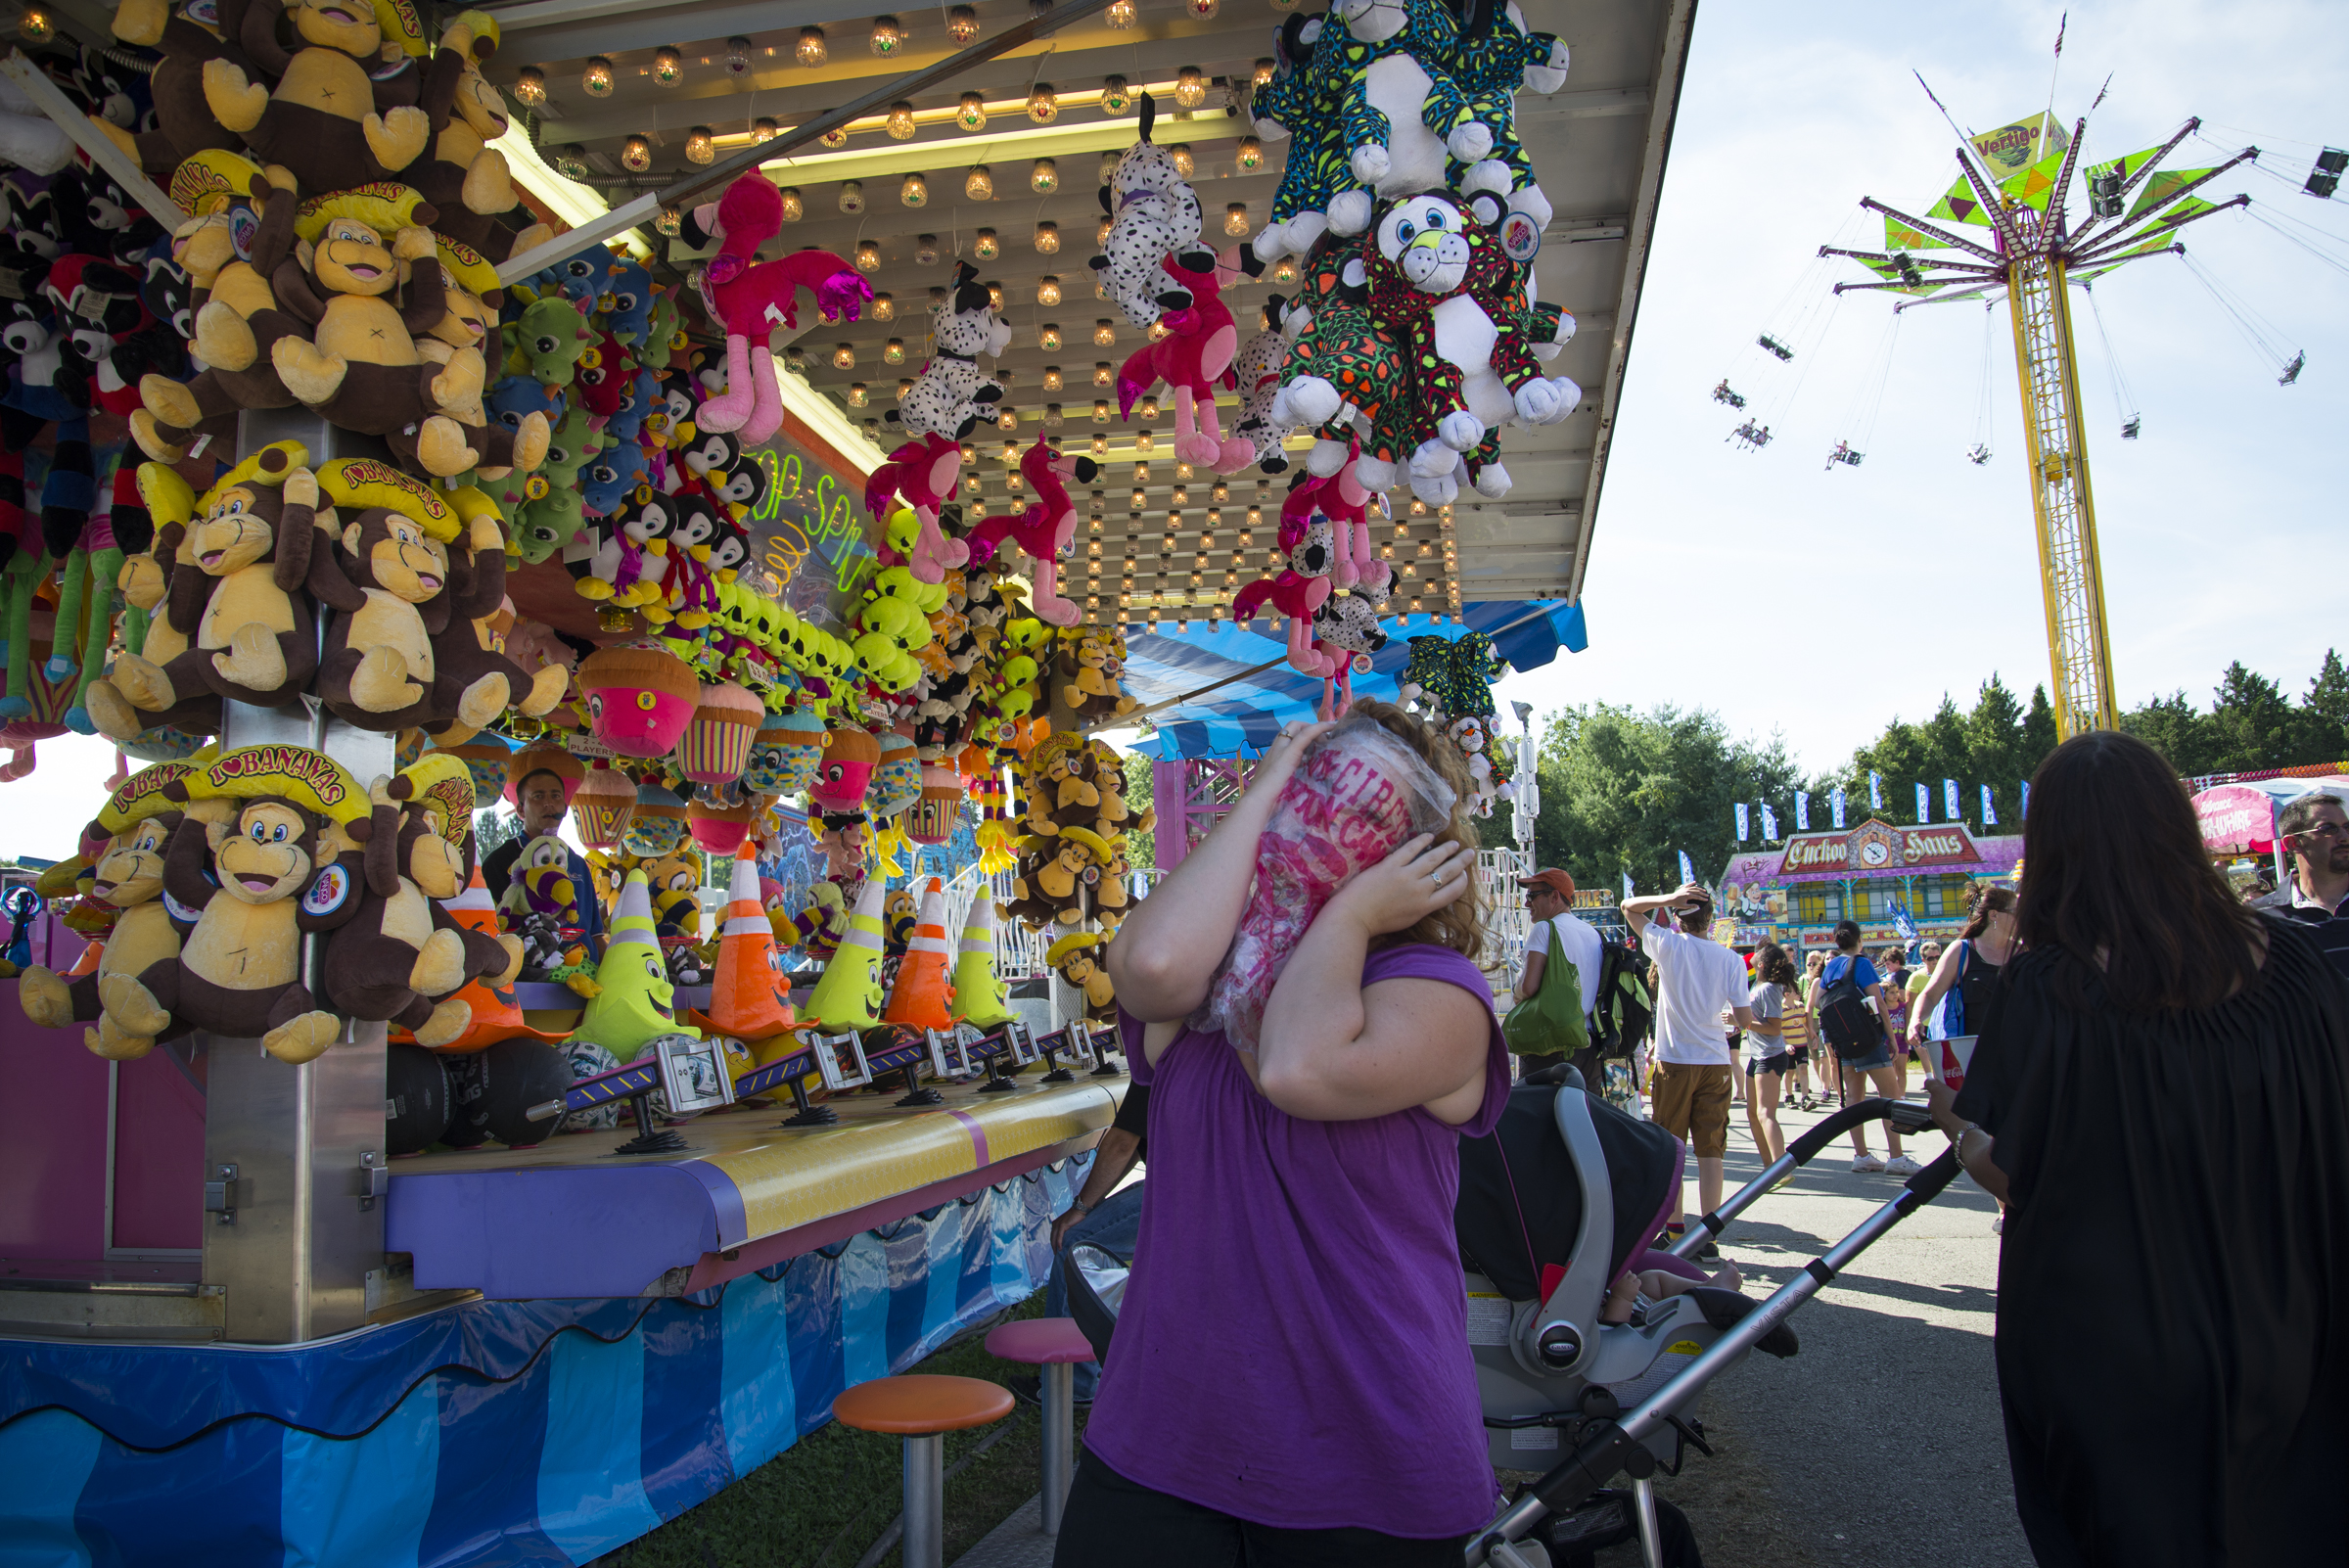 08252013-CarnivalScene-JuliaLuckettPhotography-12